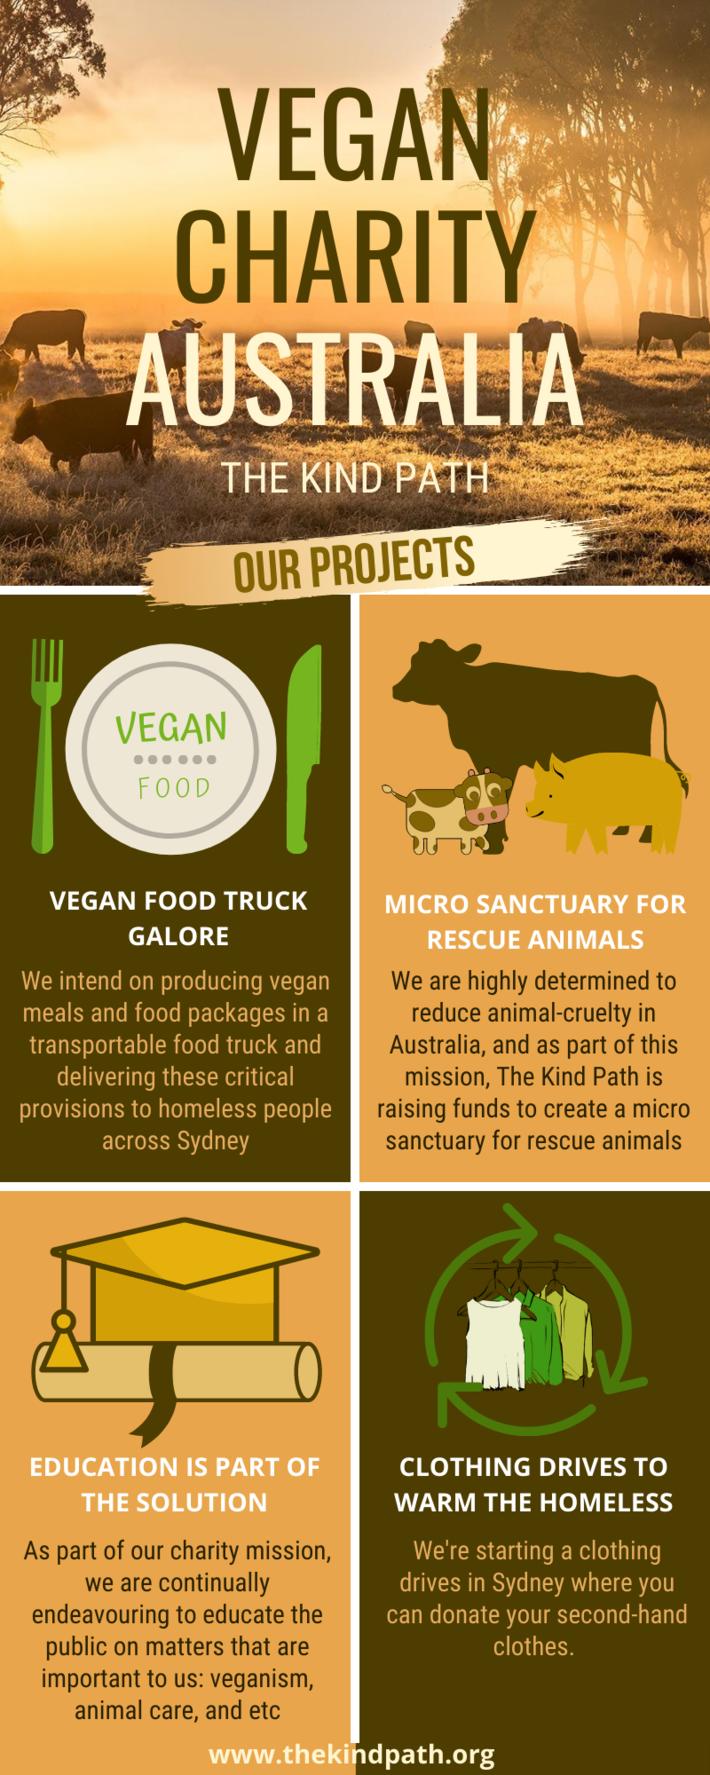 Vegan charity australia